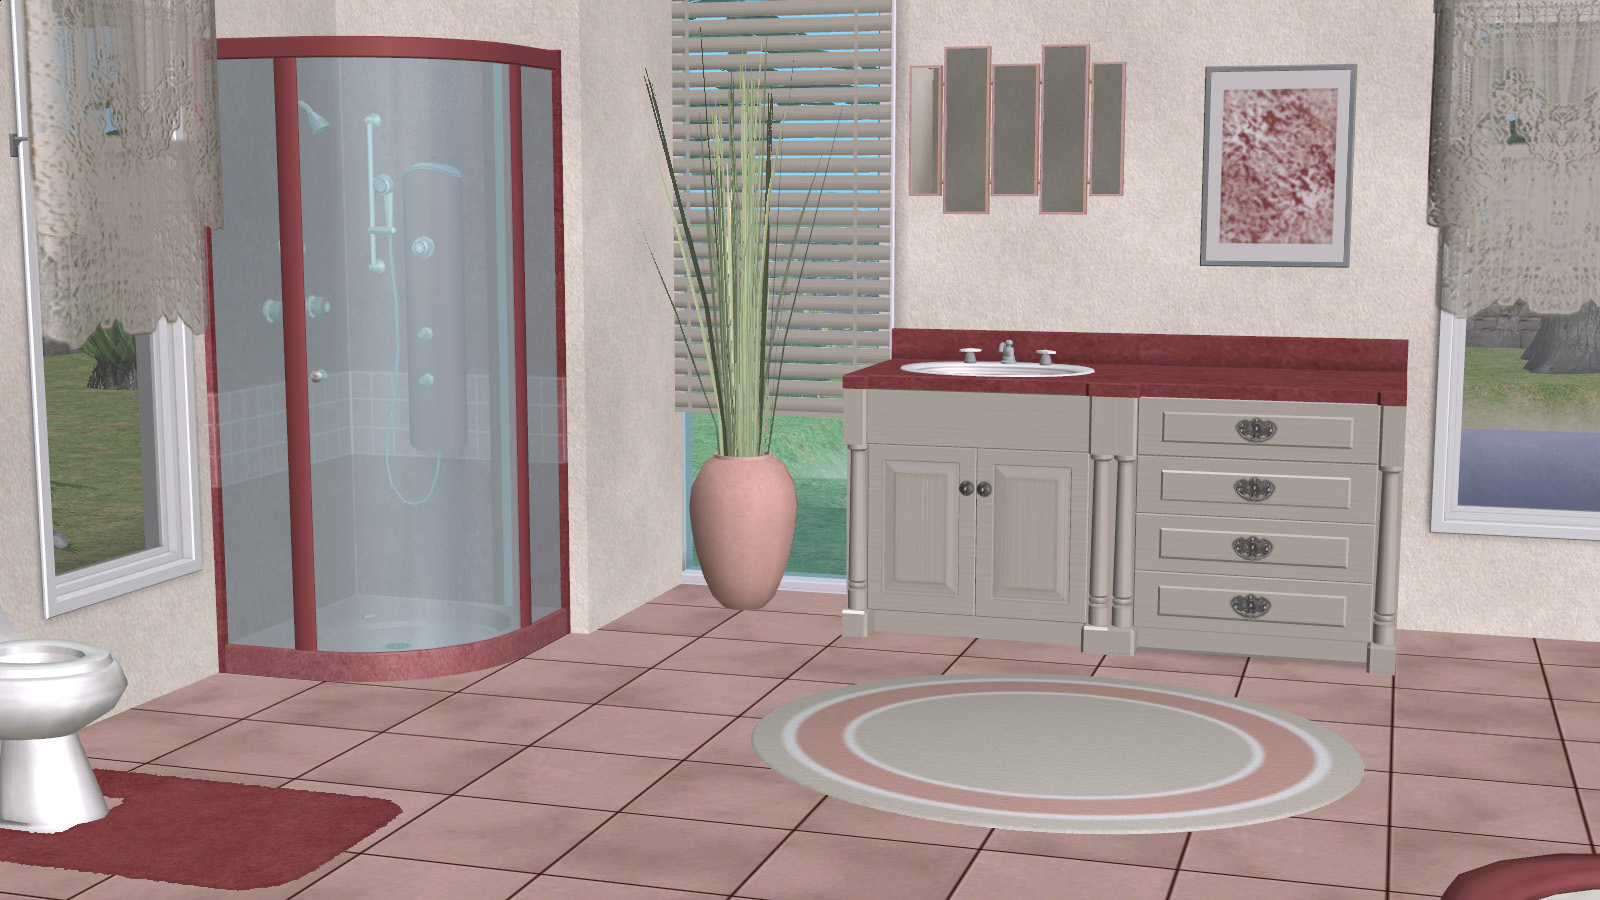 ModTheSims - Pink Sugar Bathroom